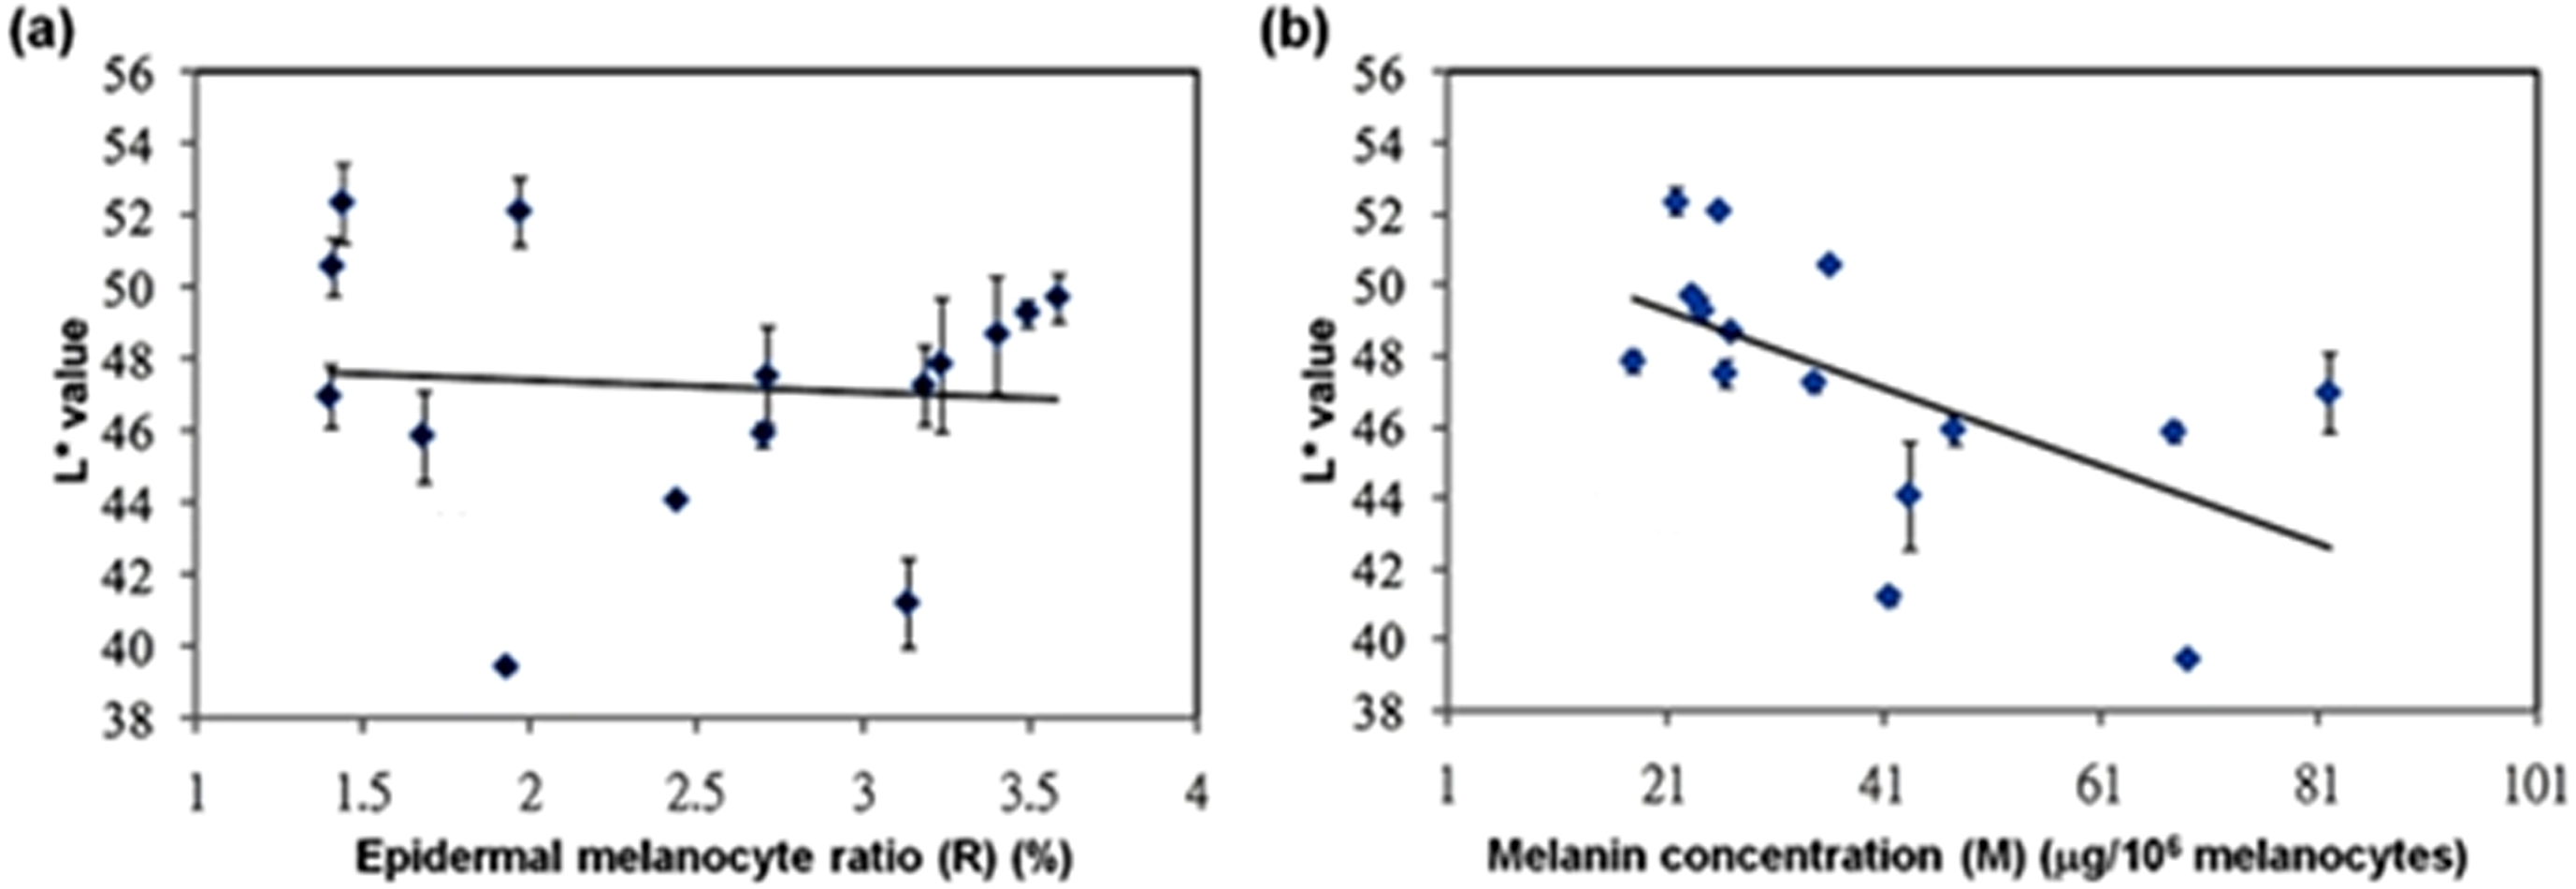 High correlation between skin color based on CIELAB color space ...